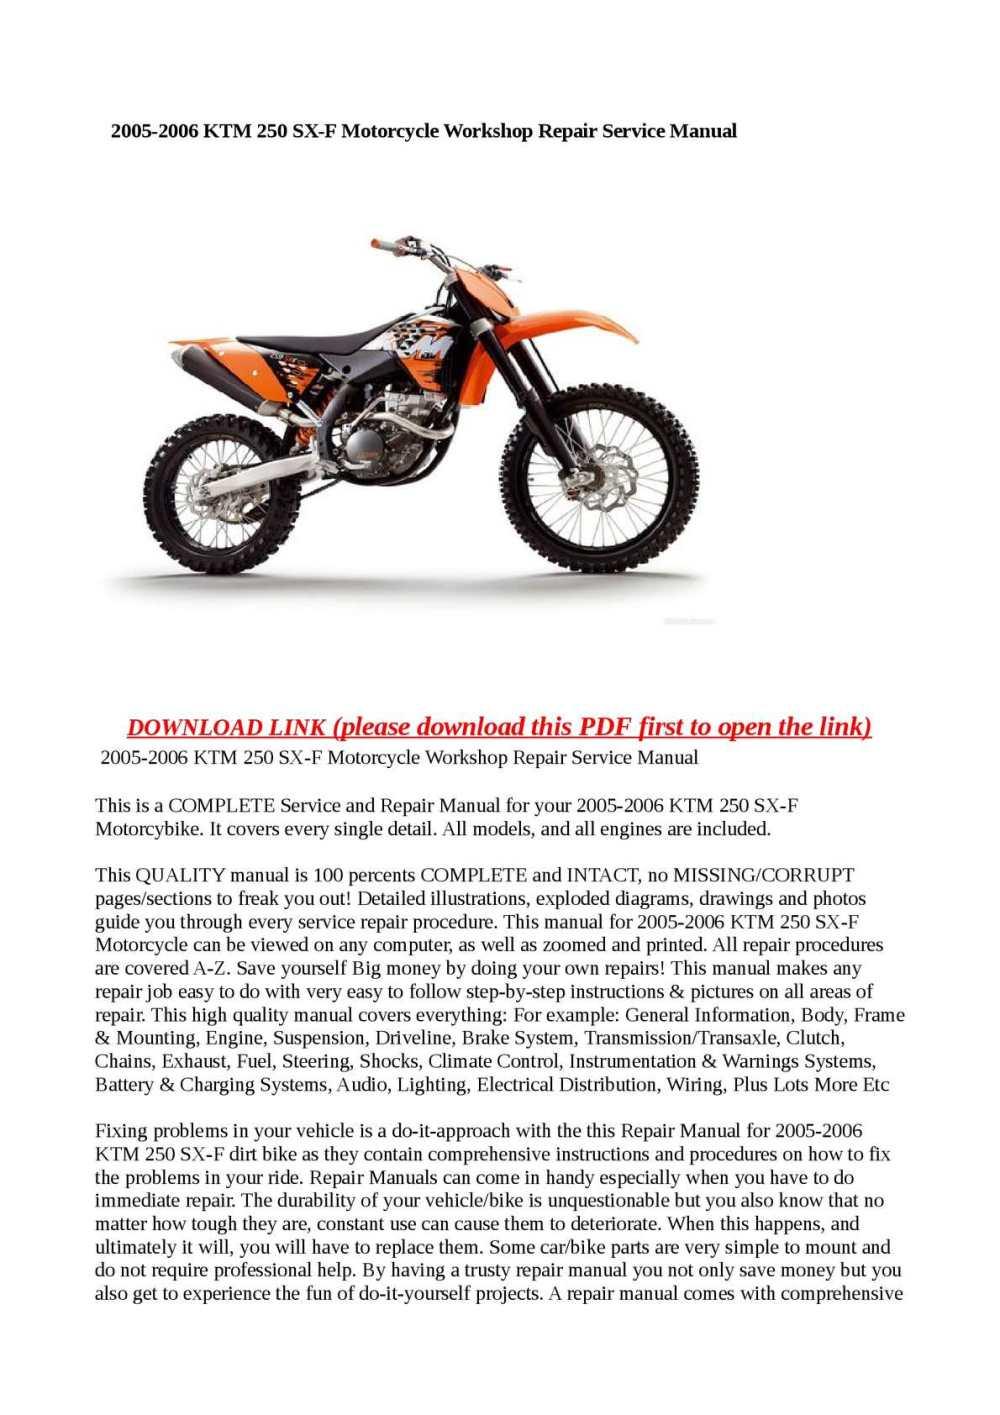 medium resolution of 2005 2006 ktm 250 sx f motorcycle workshop repair service manual